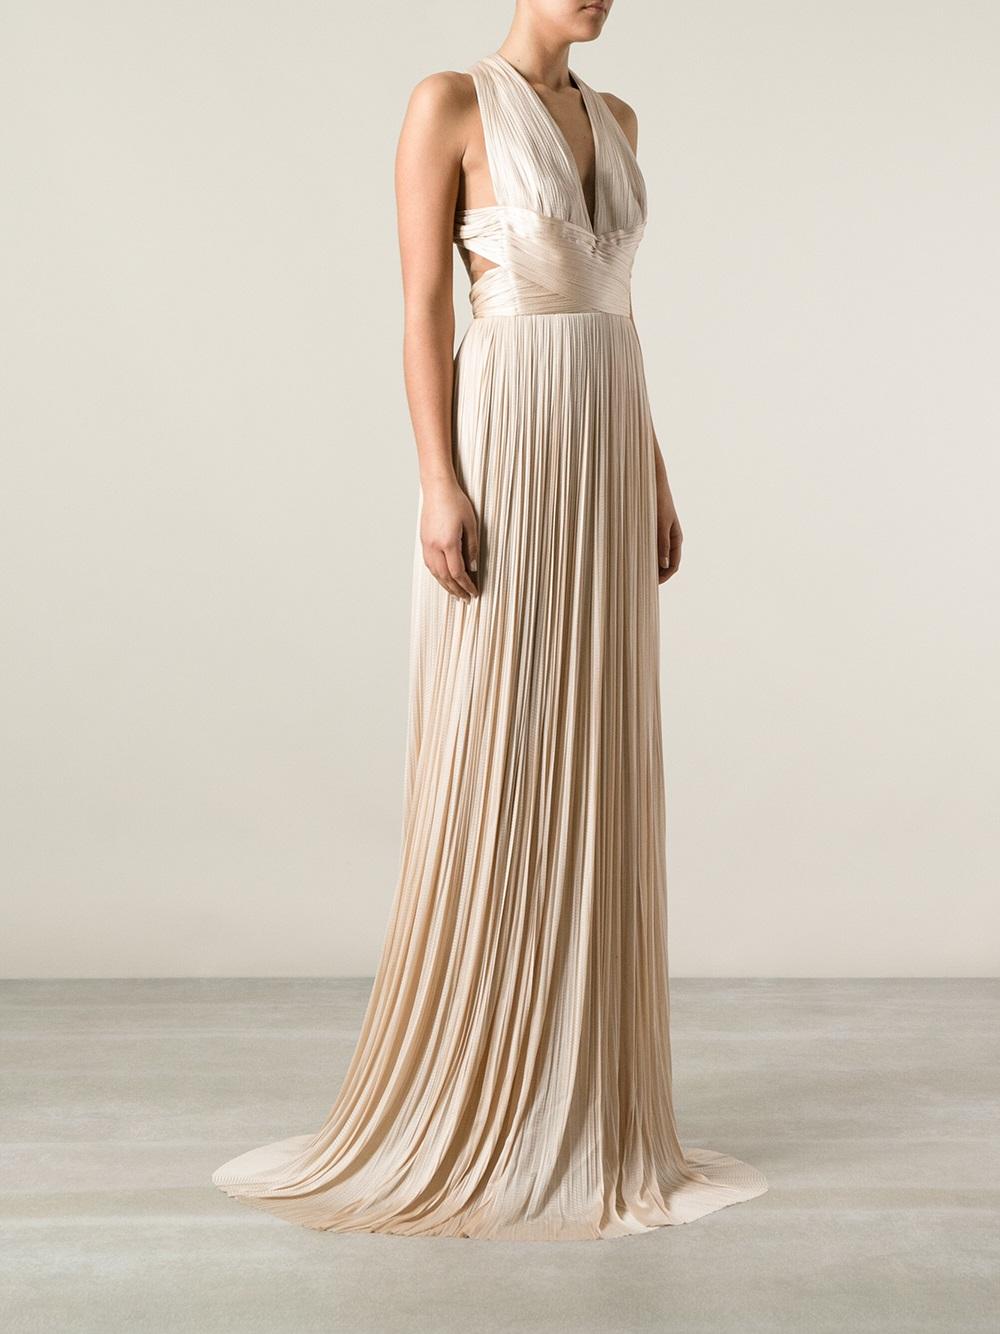 a580d4faa1e9 Lyst - Maria Lucia Hohan Flamingo Dress in Natural